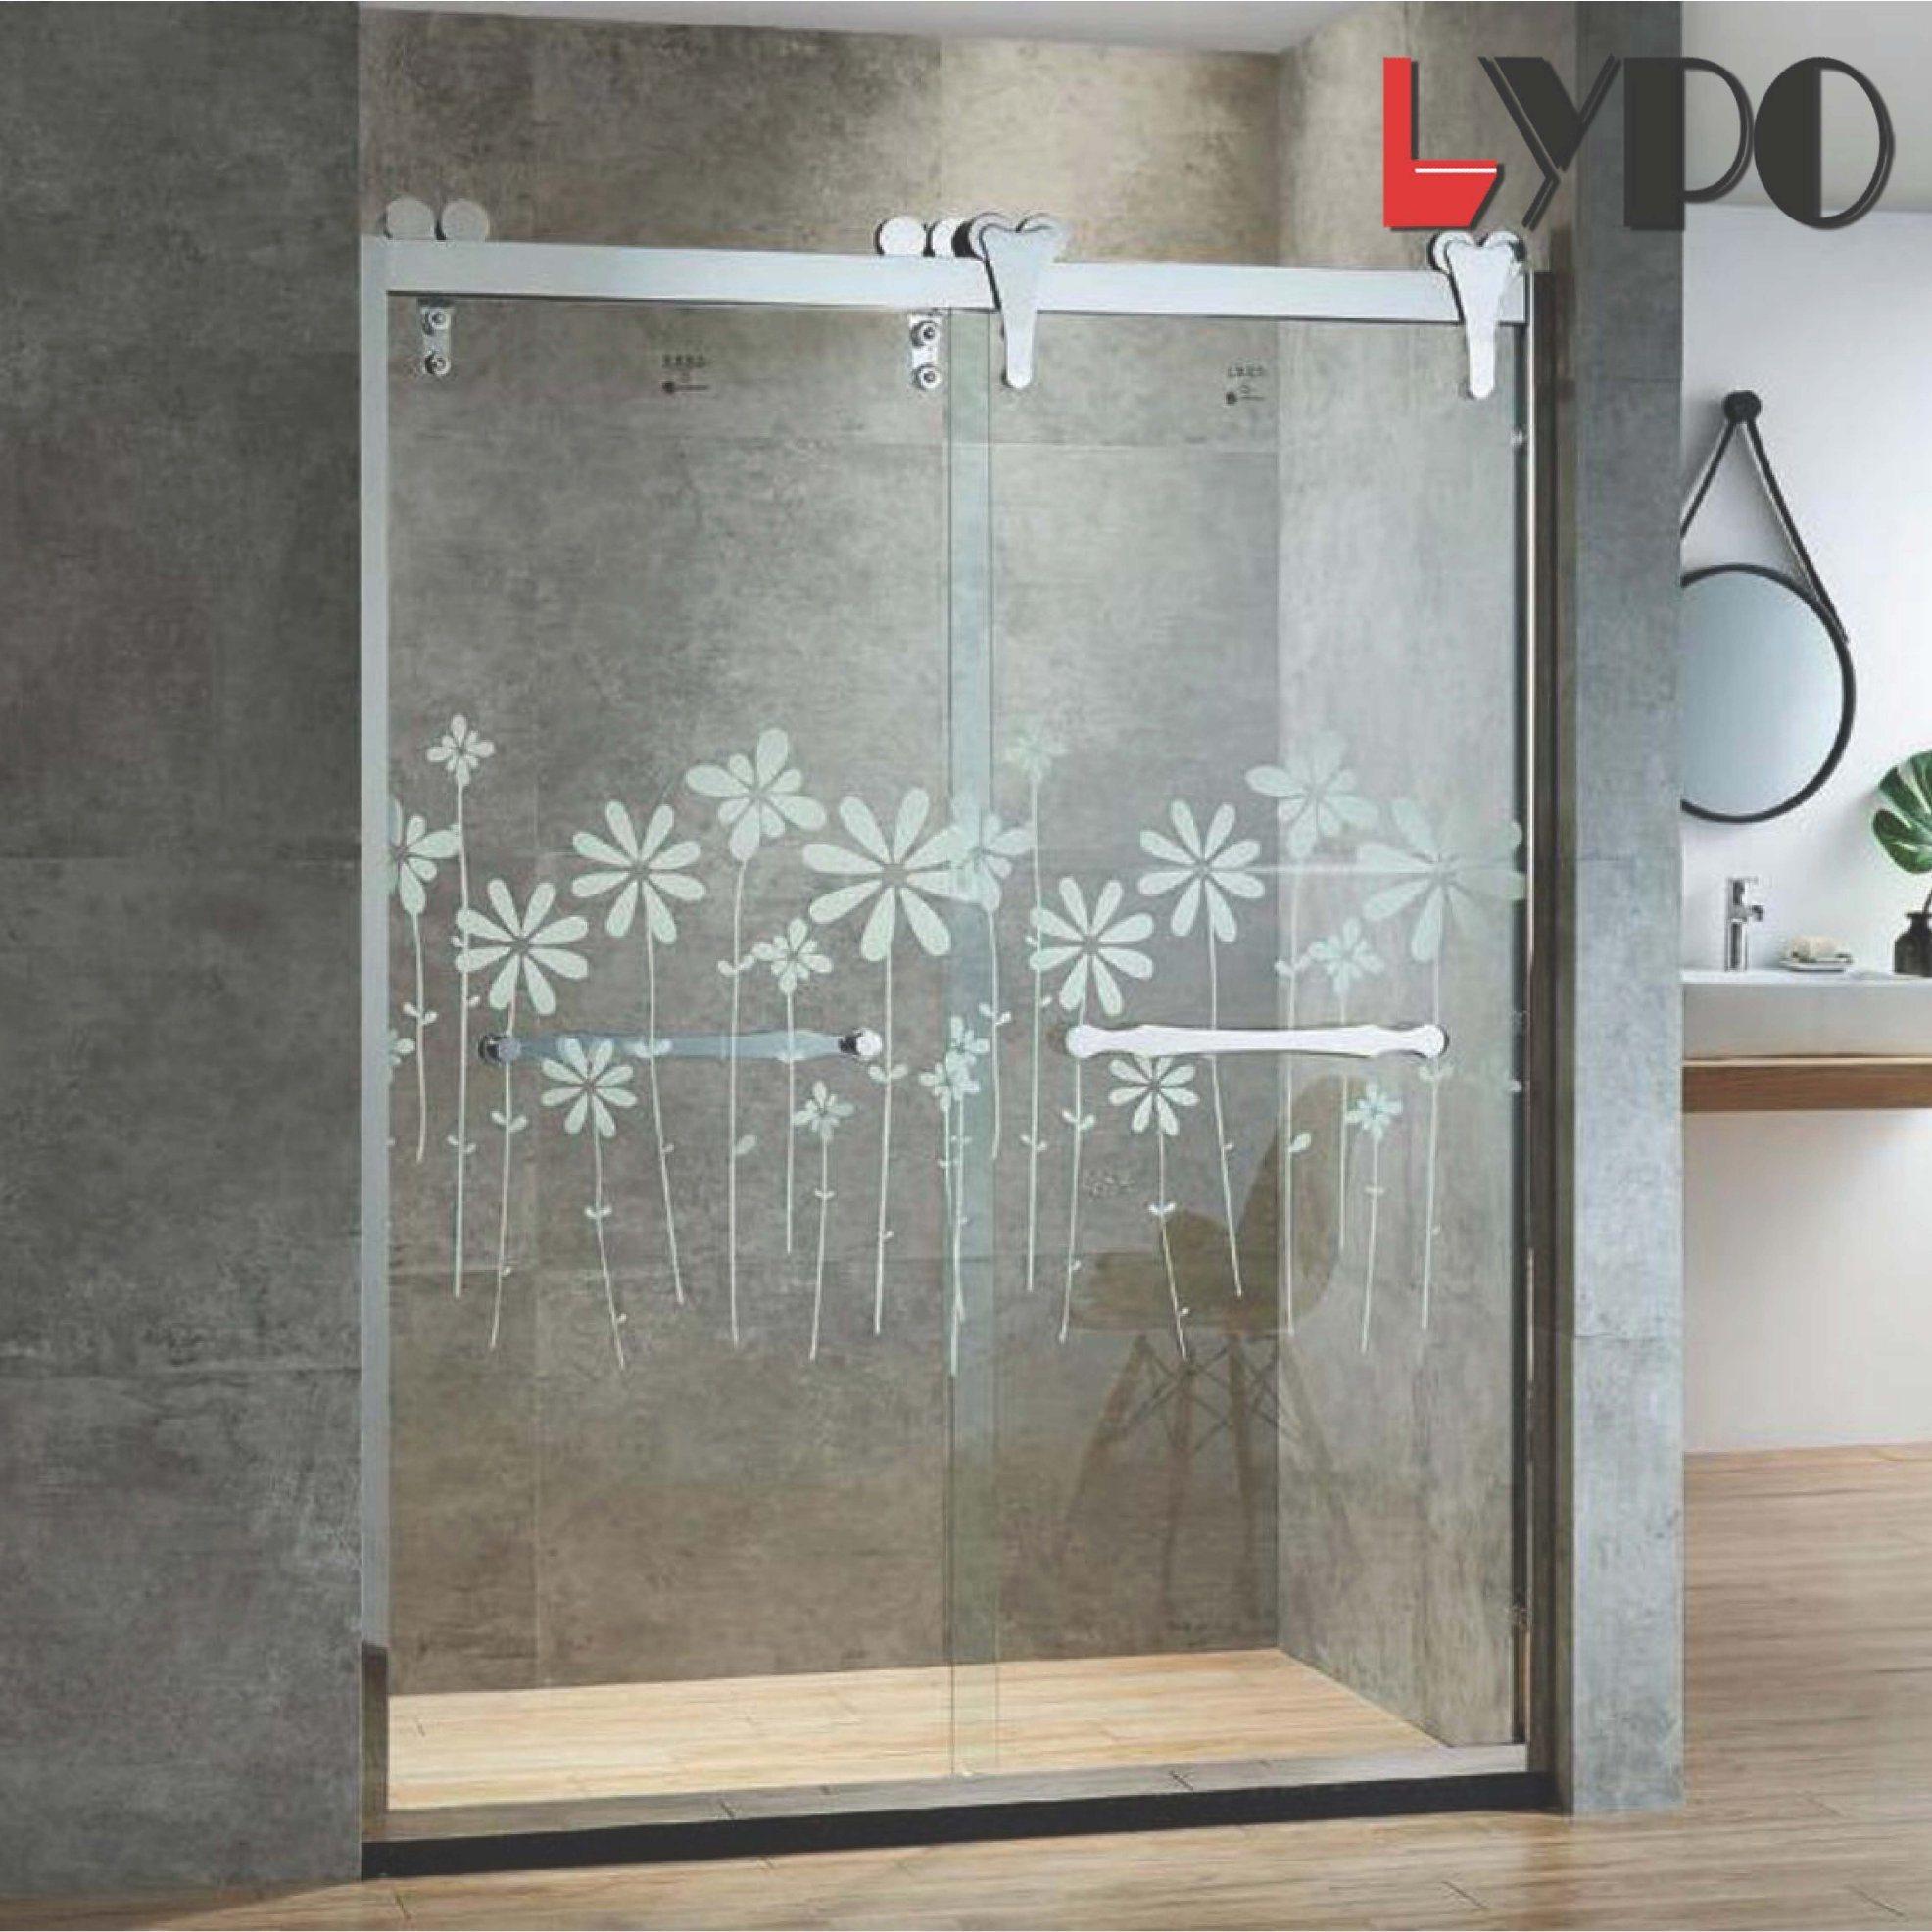 China Luxury Painting Sanitary Ware 10mm Tempered Glass Bathroom Big ...